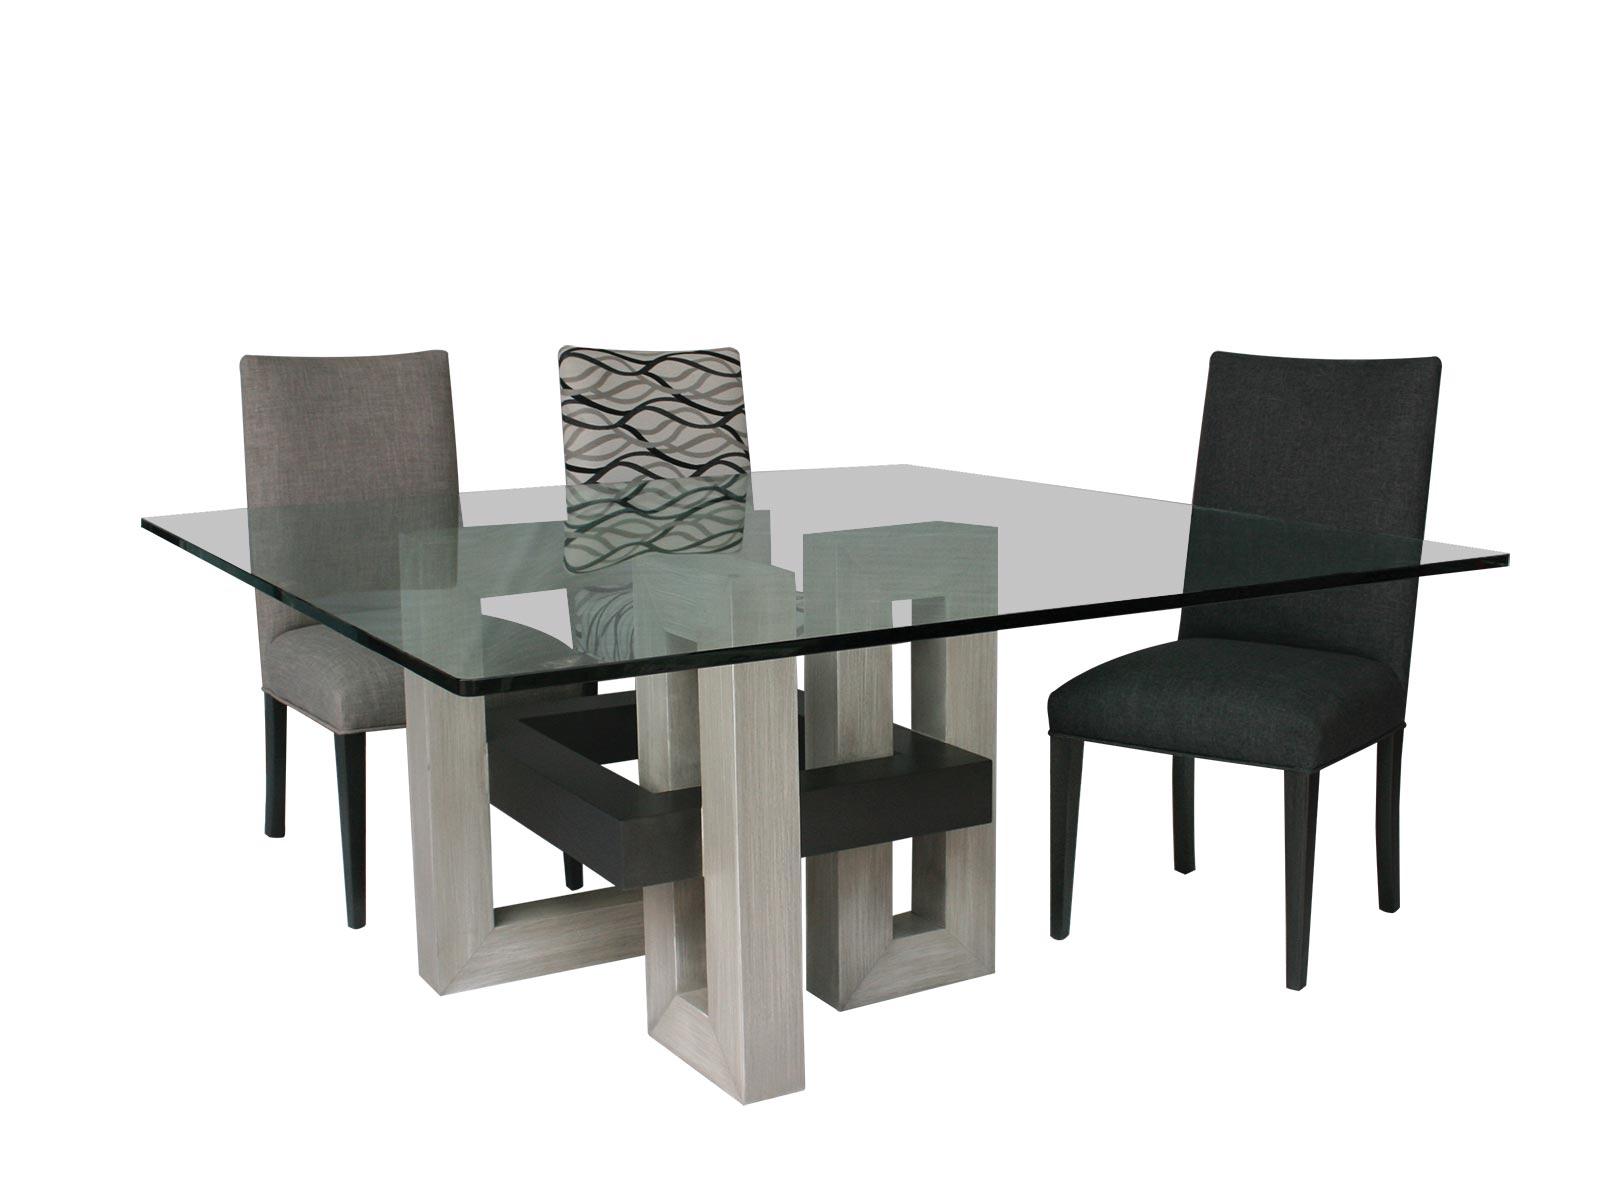 Comedores de cristal mesas de comedor modernas de cristal for Bases de mesas cromadas